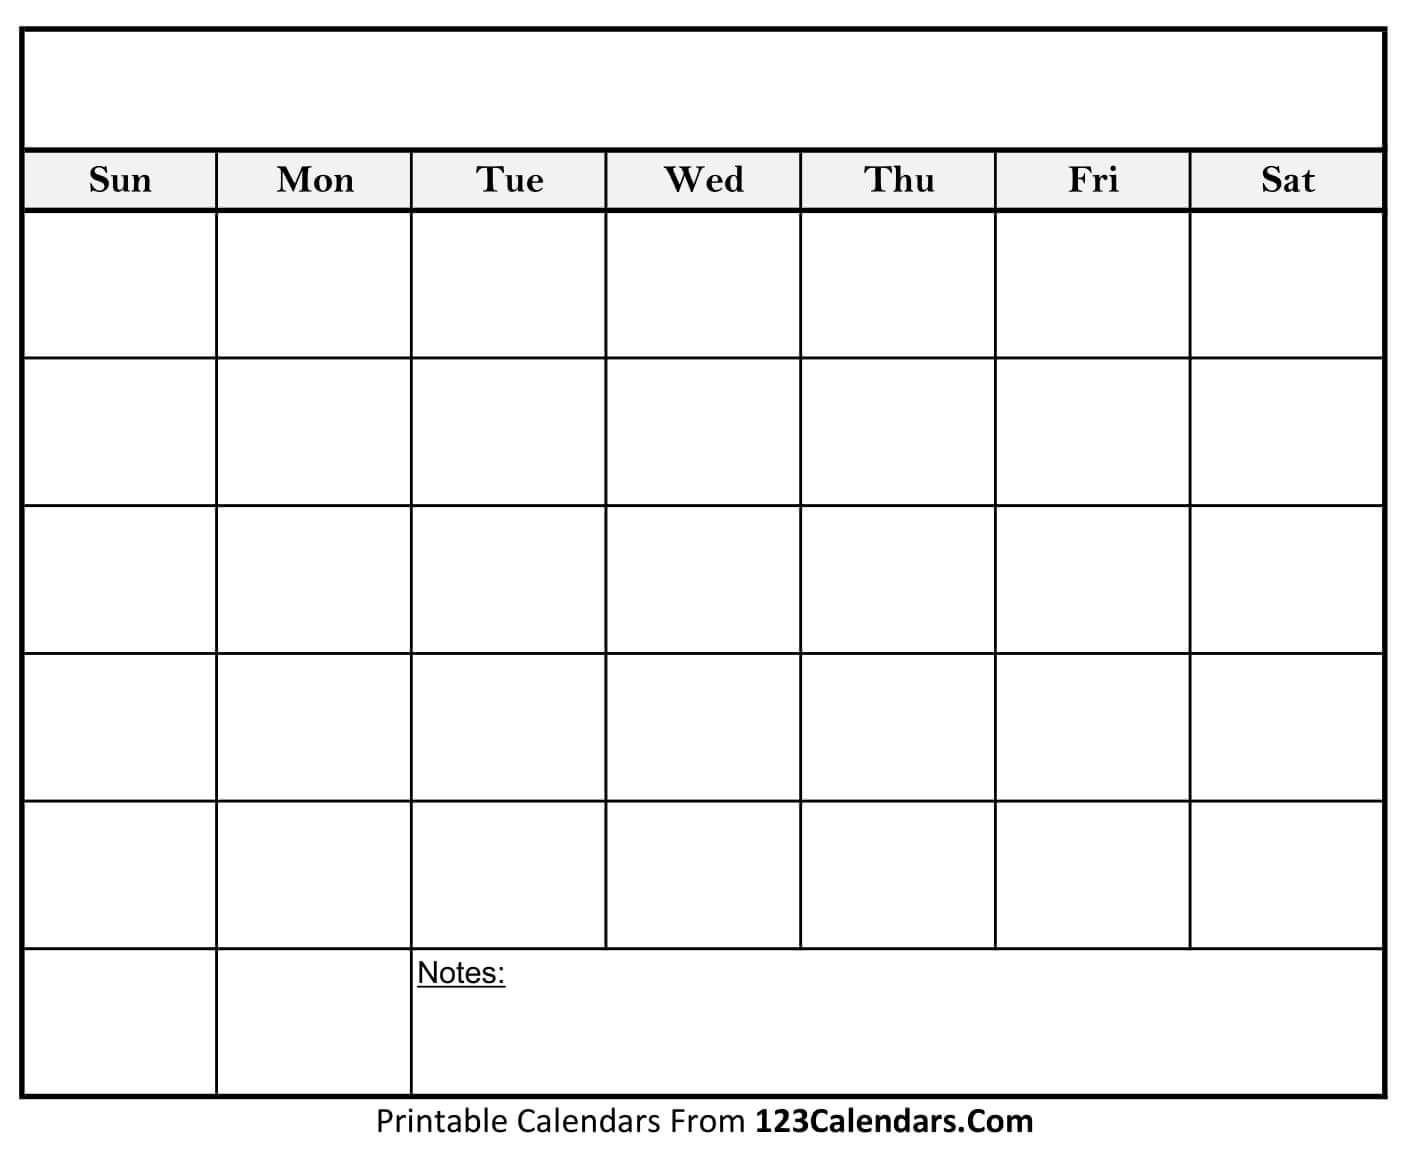 Blank Calendar | Printable Blank Calendar, Calender Template-Printable Blank Calendar Template With Notes